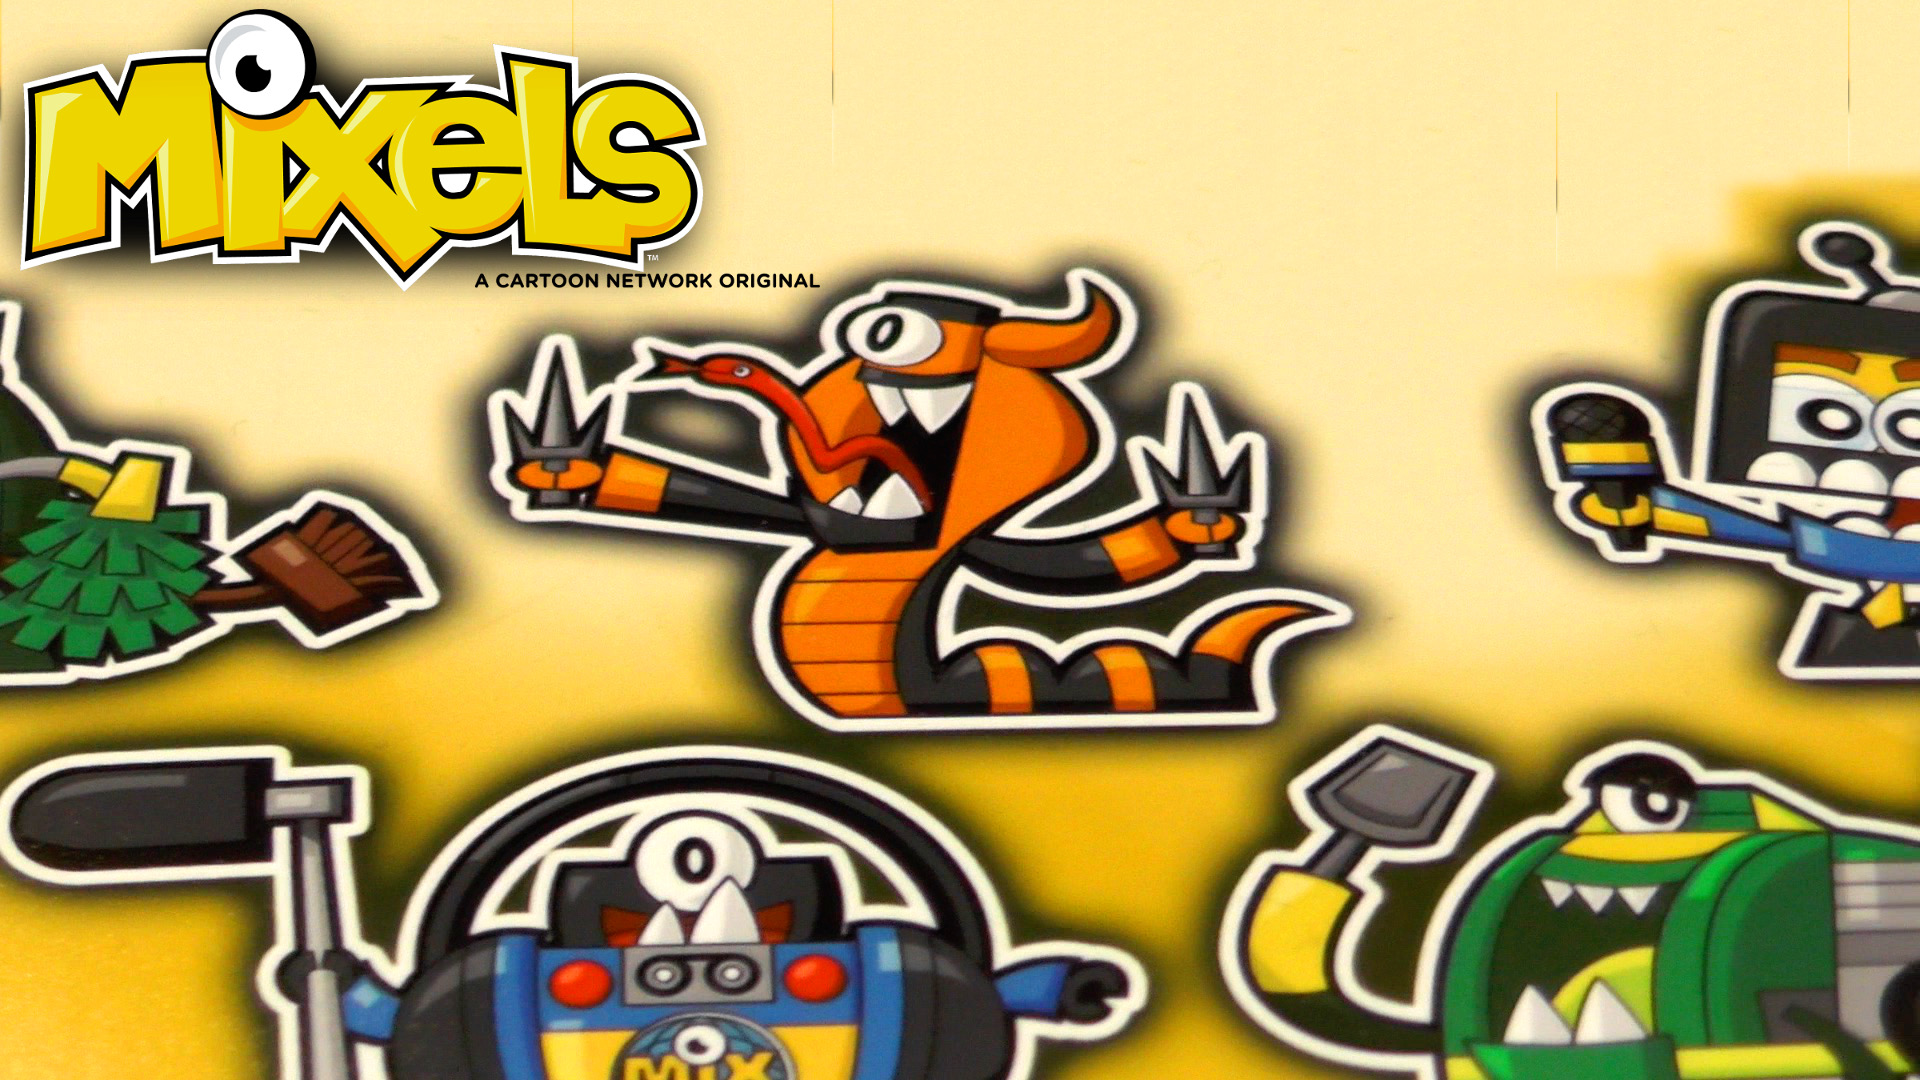 Mixels packaging reveals cartoon character art for season 3